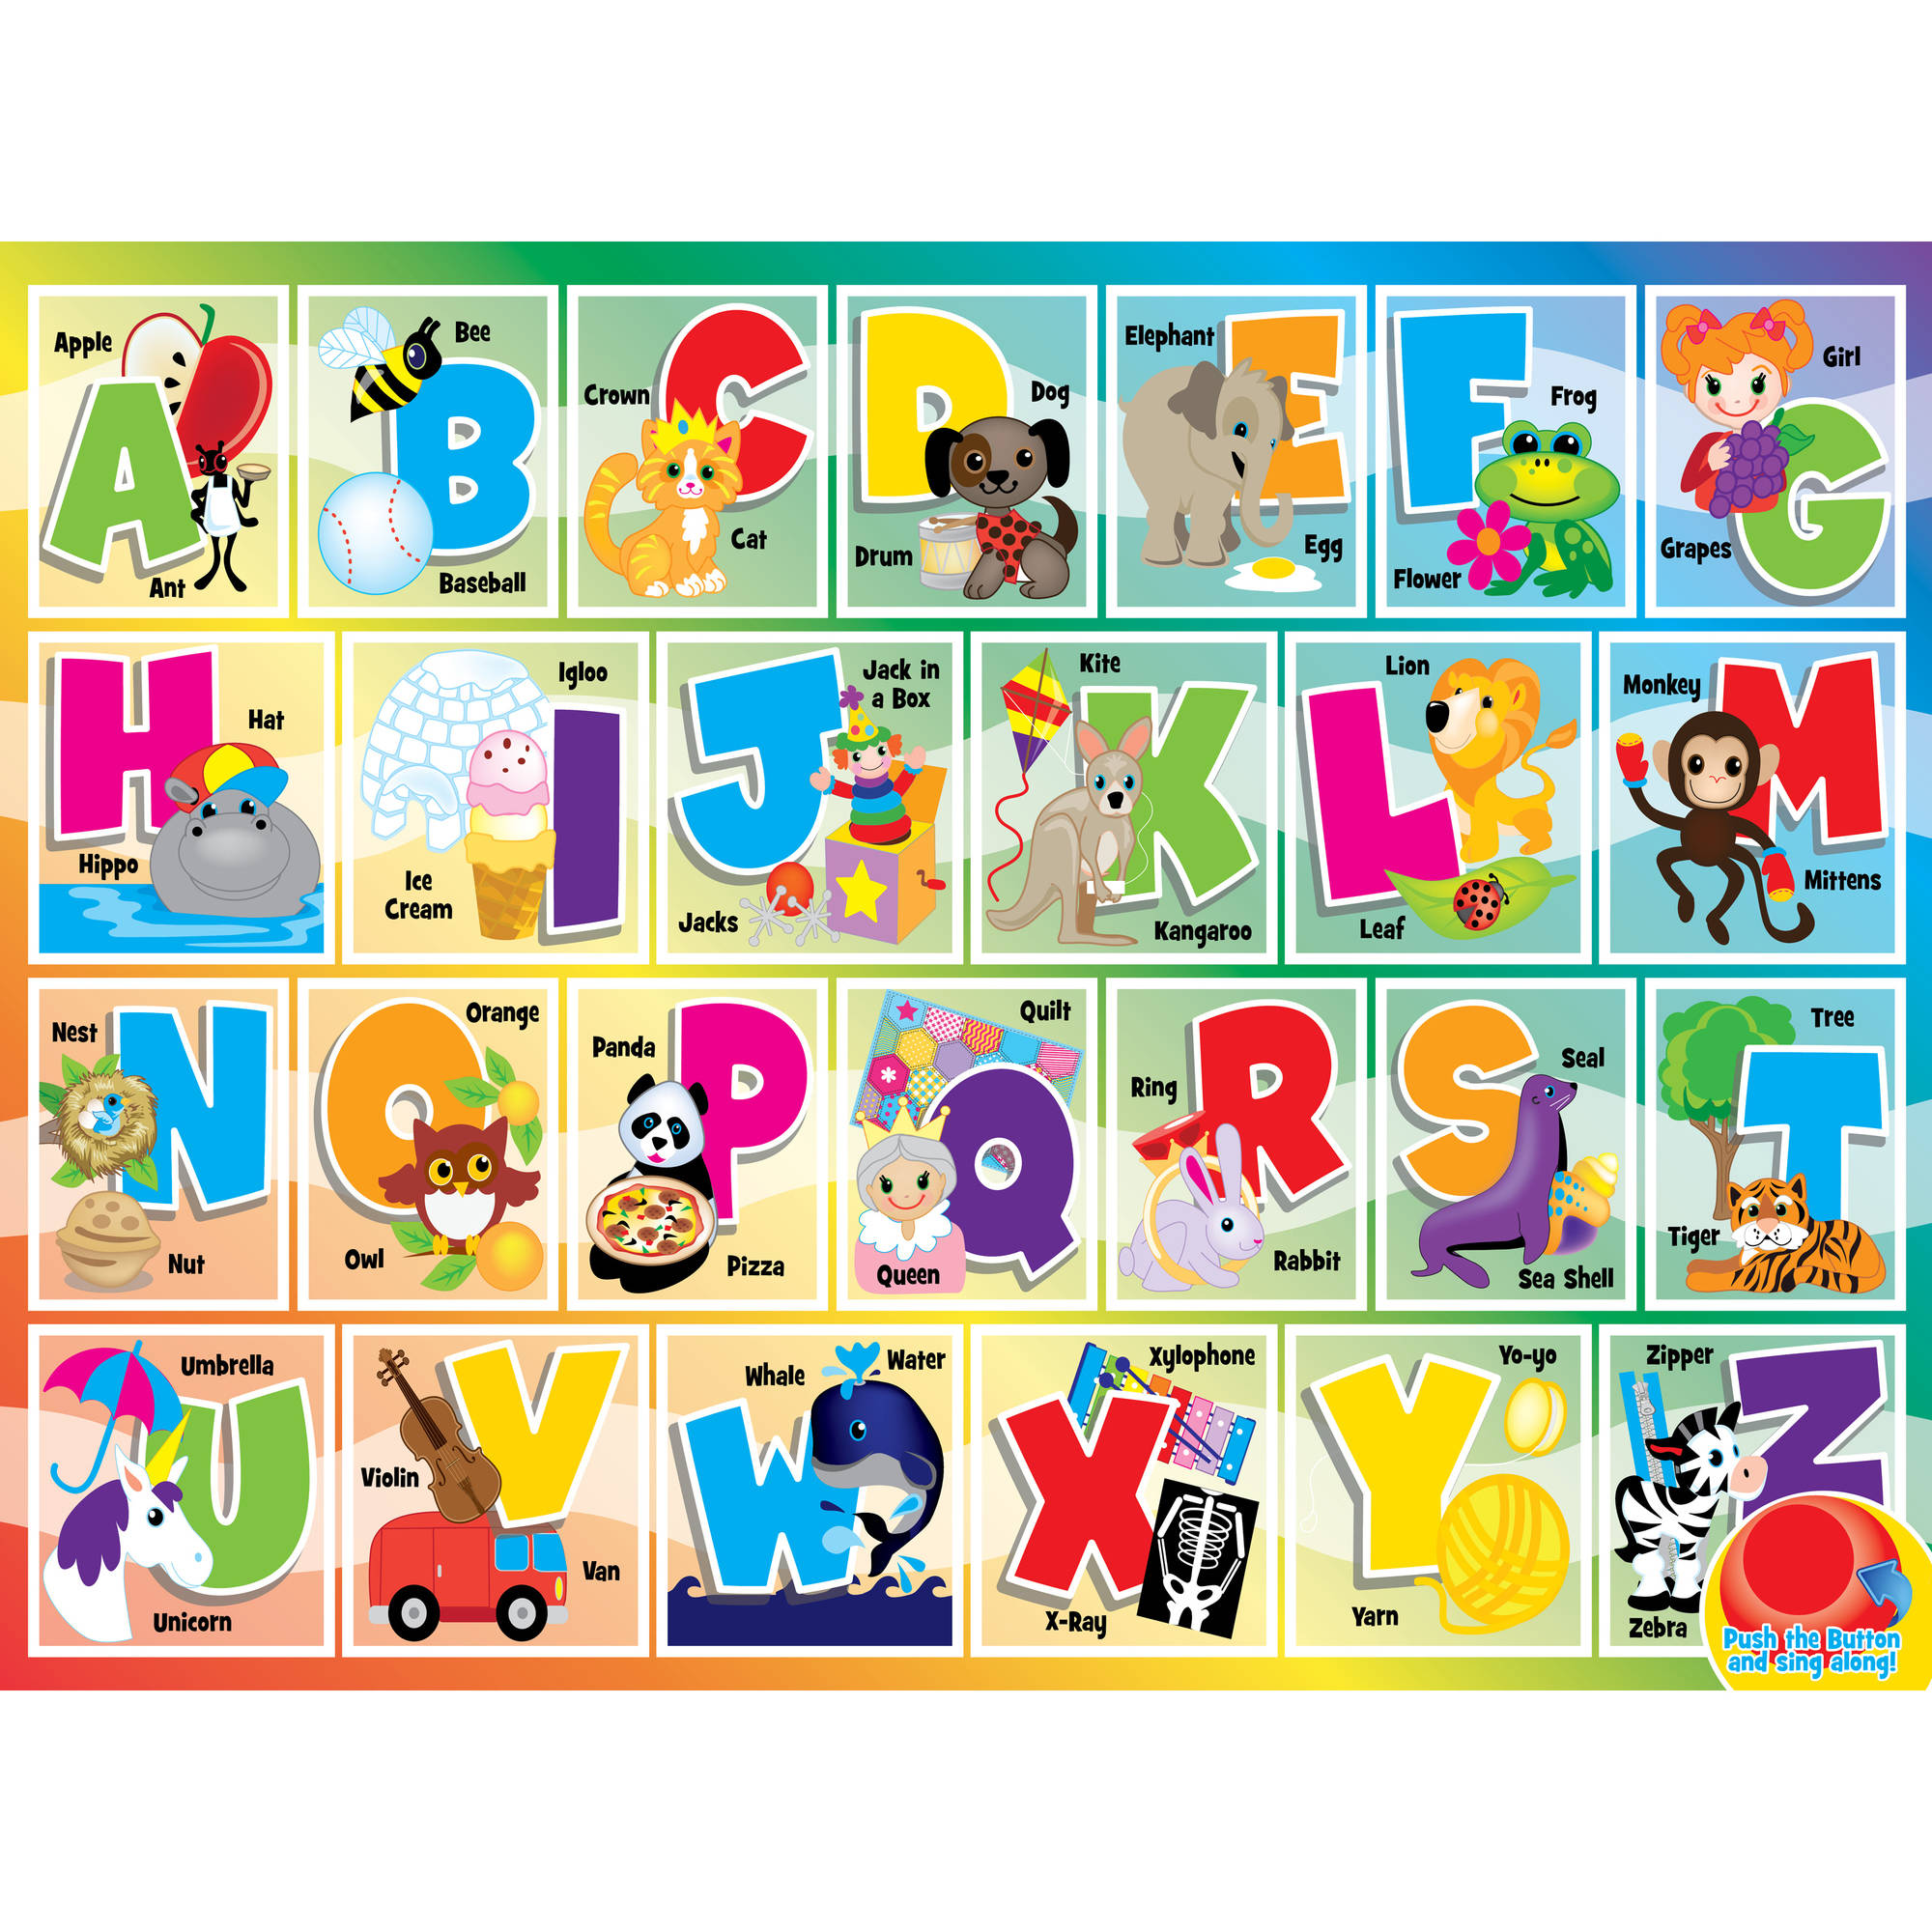 MasterPieces Alphabet Song 24 Piece Puzzle by MasterPieces Puzzle Company